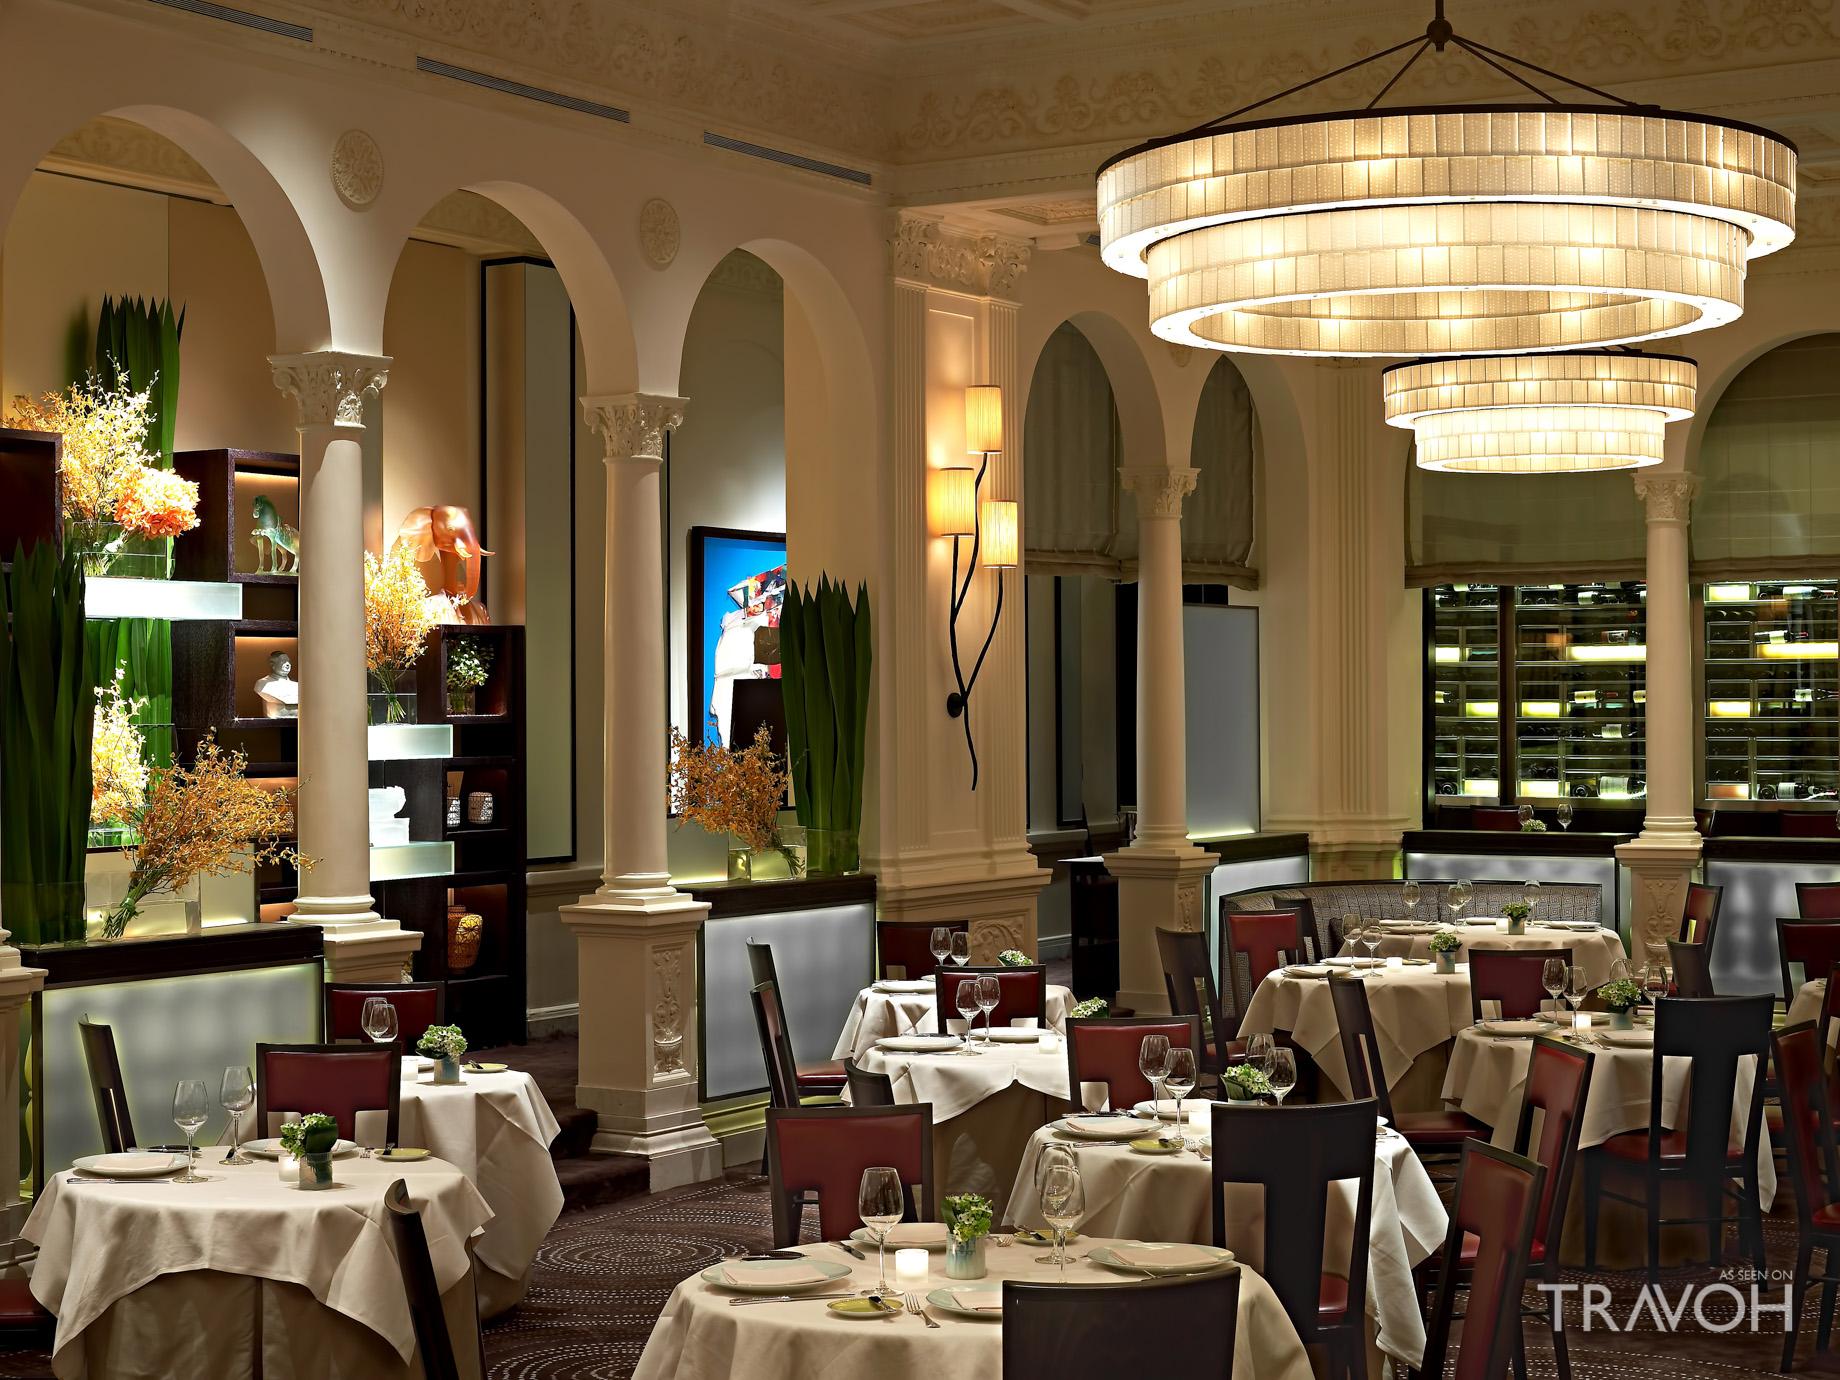 Daniel Restaurant - 60 E 65th St, New York, NY 10065, USA